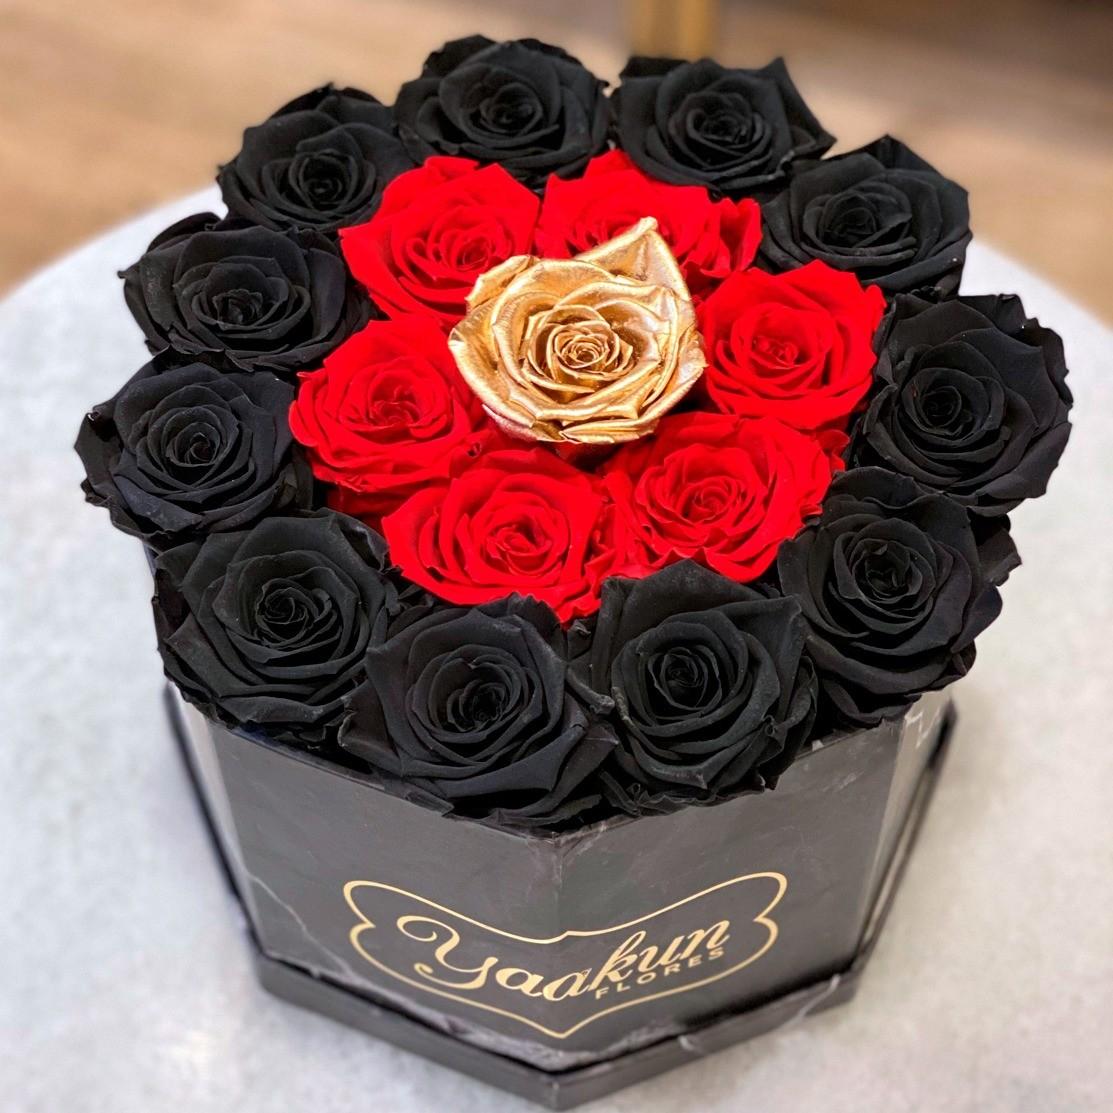 Rosas eternas en caja cuadrada octagonal black, red and gold